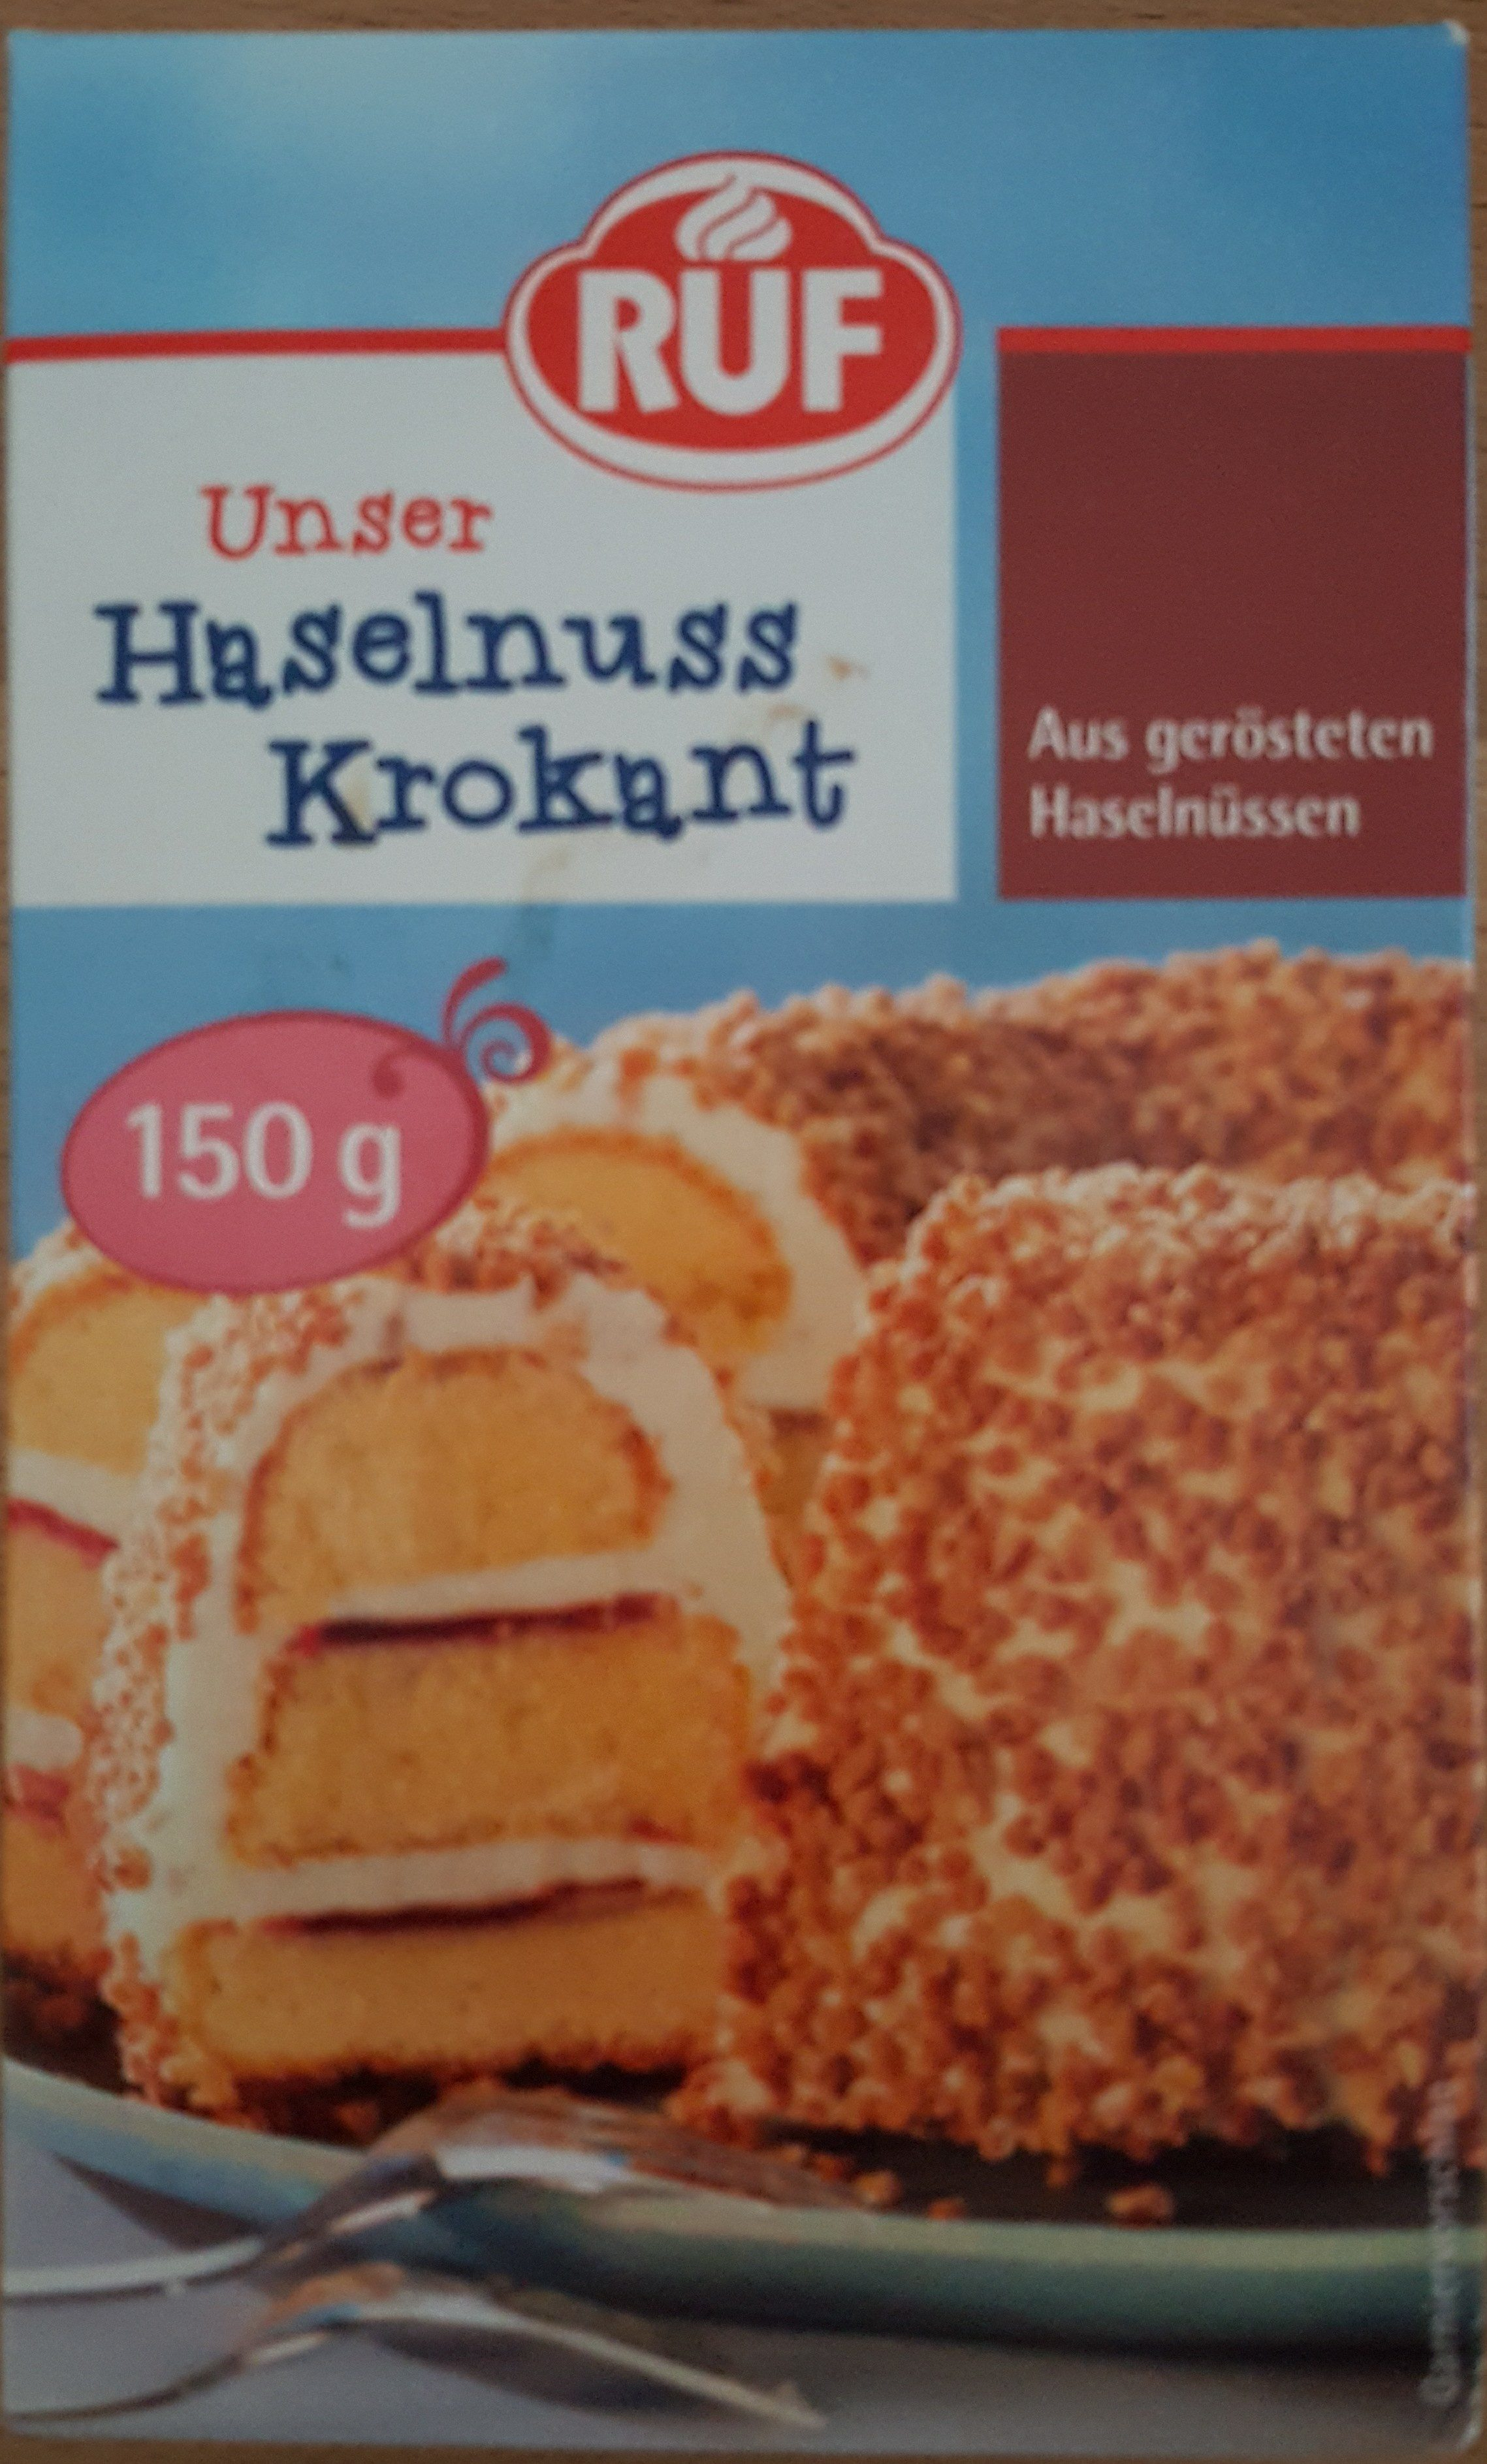 Unser Haselnuss-Krokant - Product - de